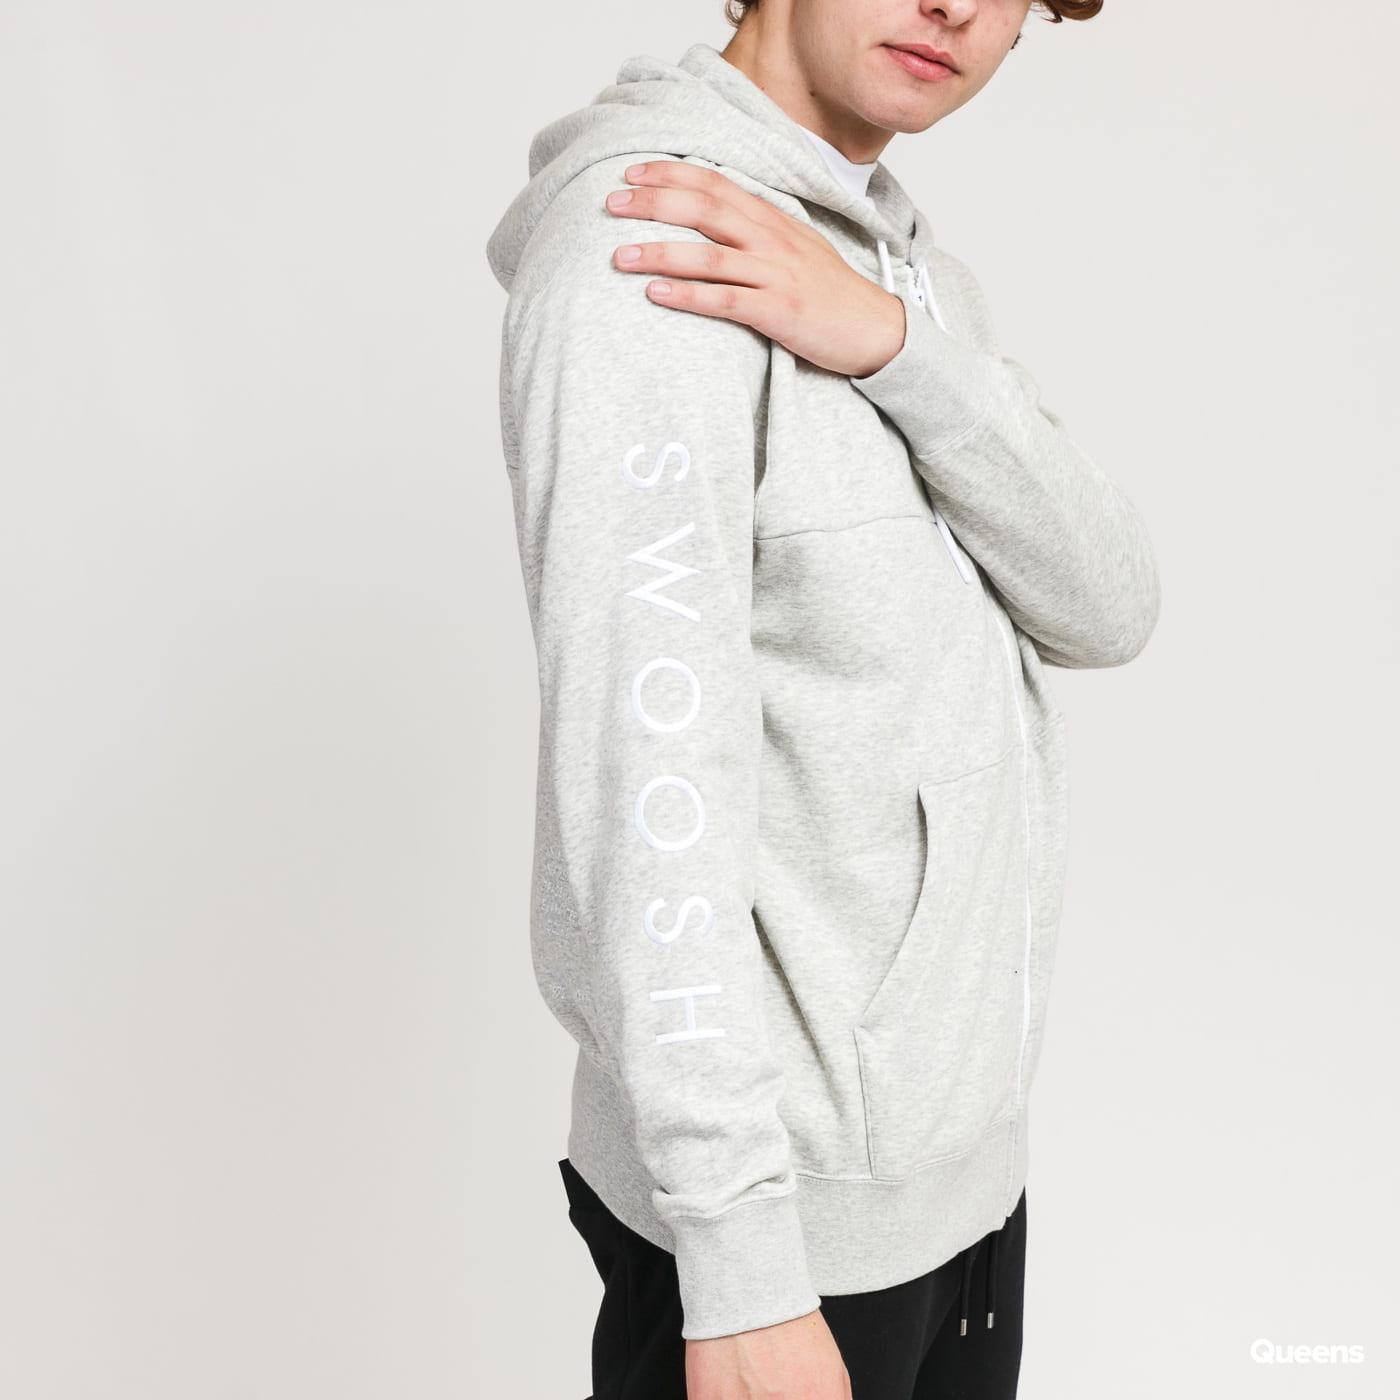 Nike M NSW Swoosh Hoodie FZ SB melange light gray